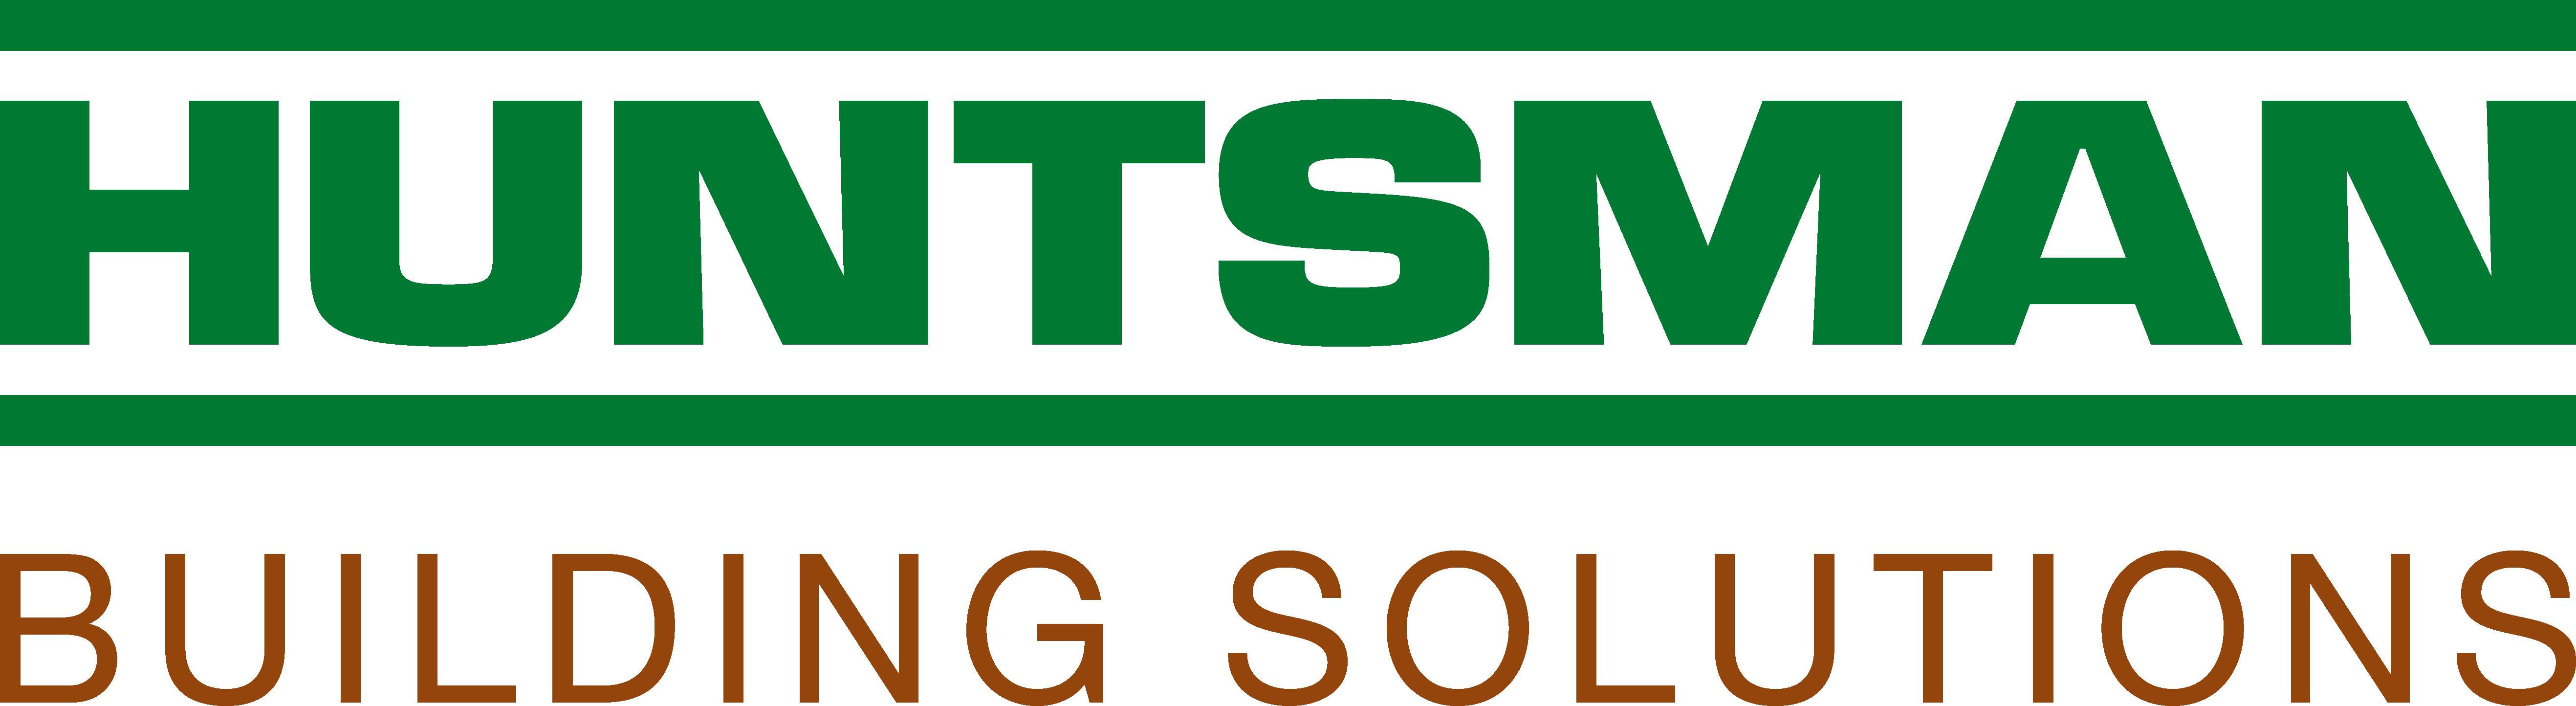 Huntsman Building Solutions Logo